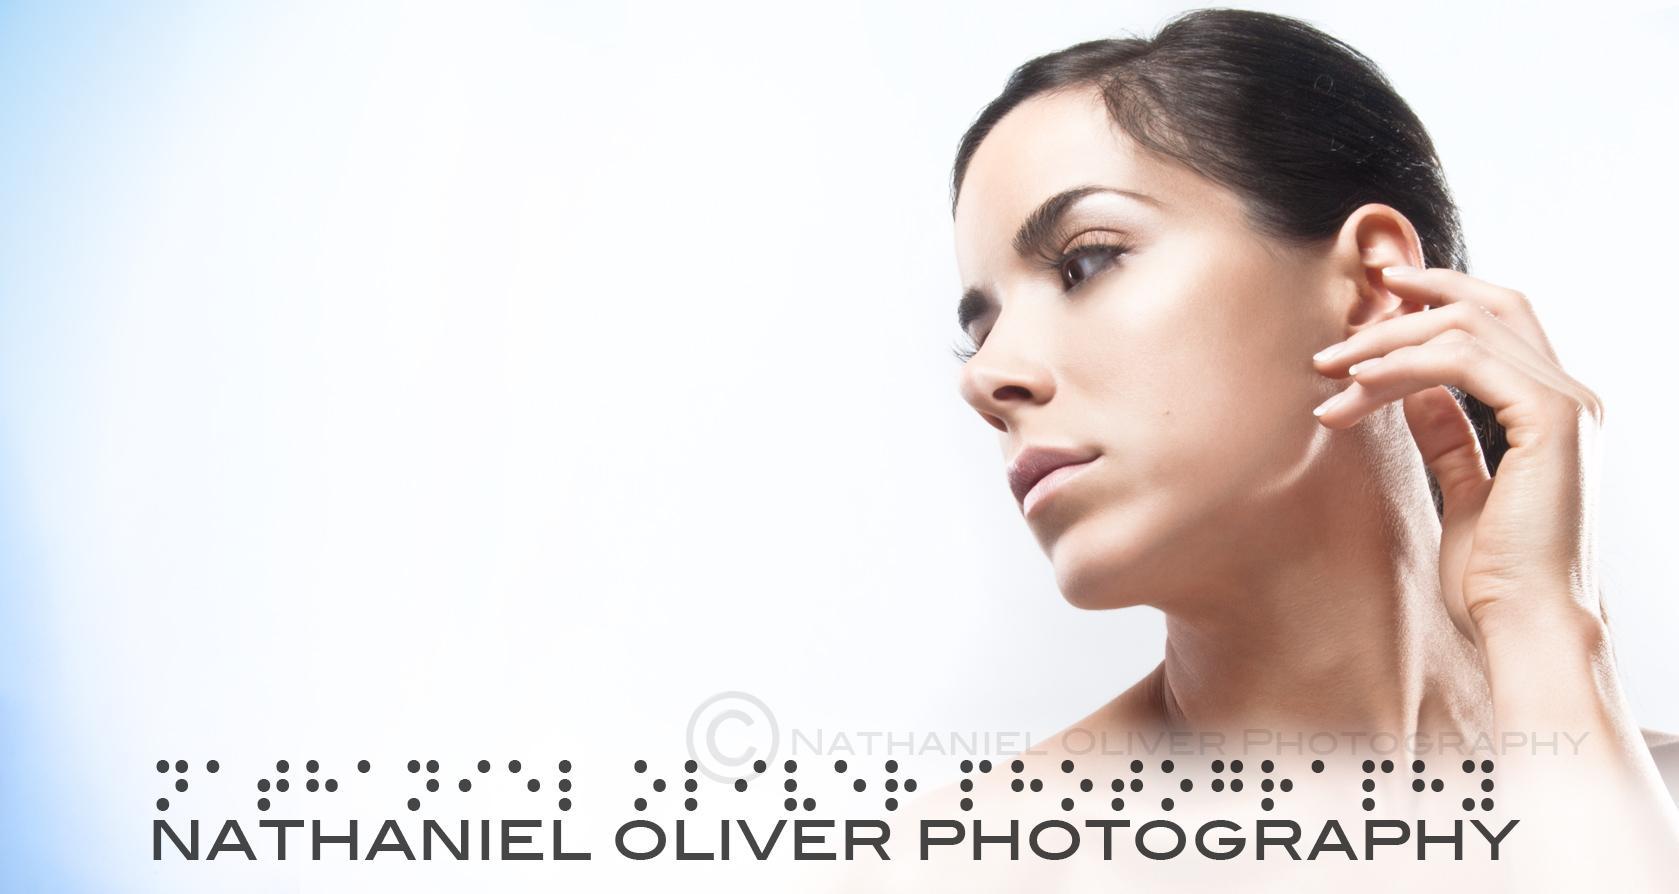 Nathaniel Oliver